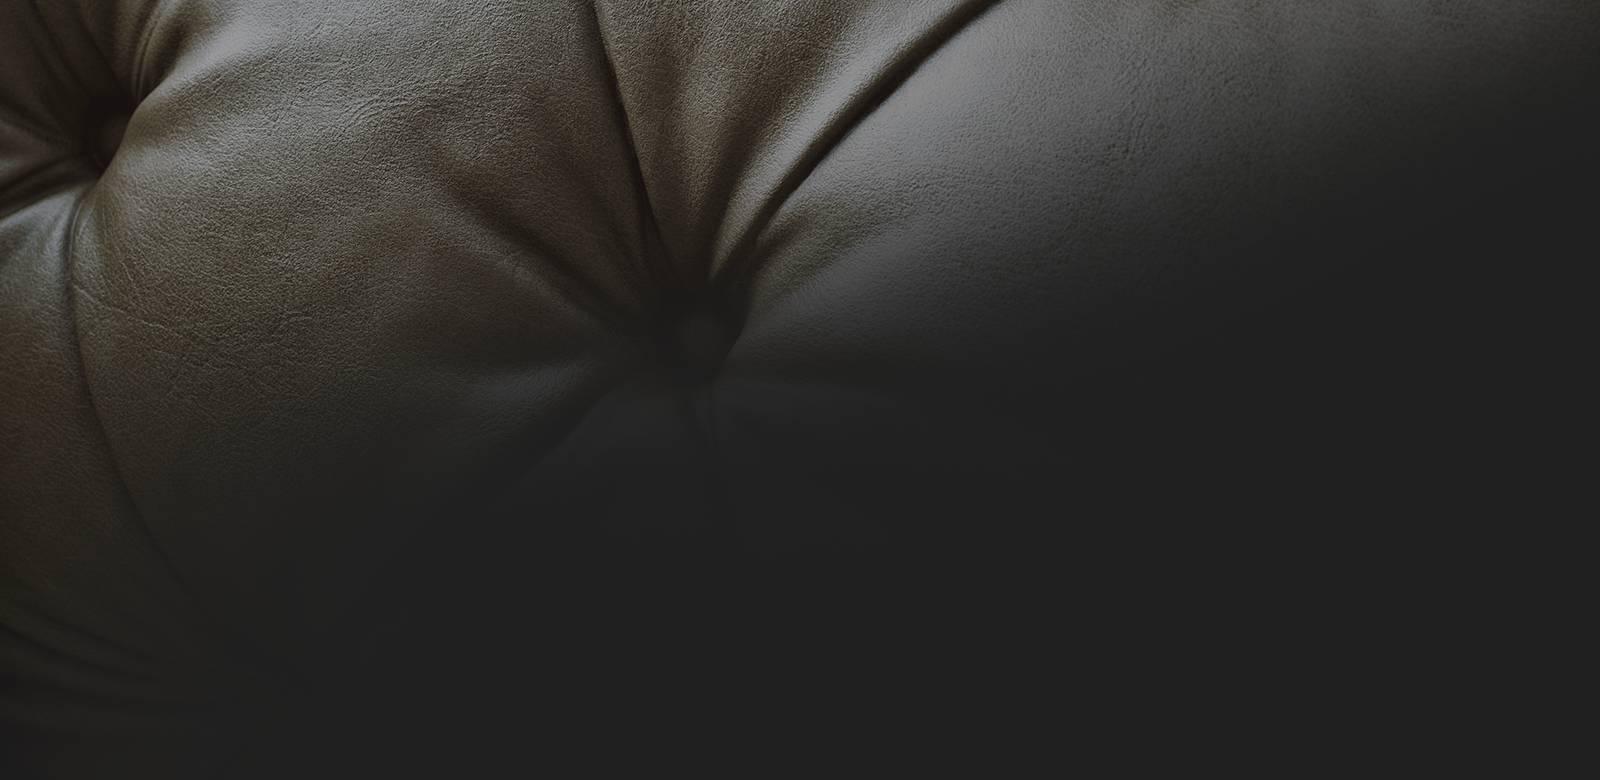 Sofology Perisa leather closeup